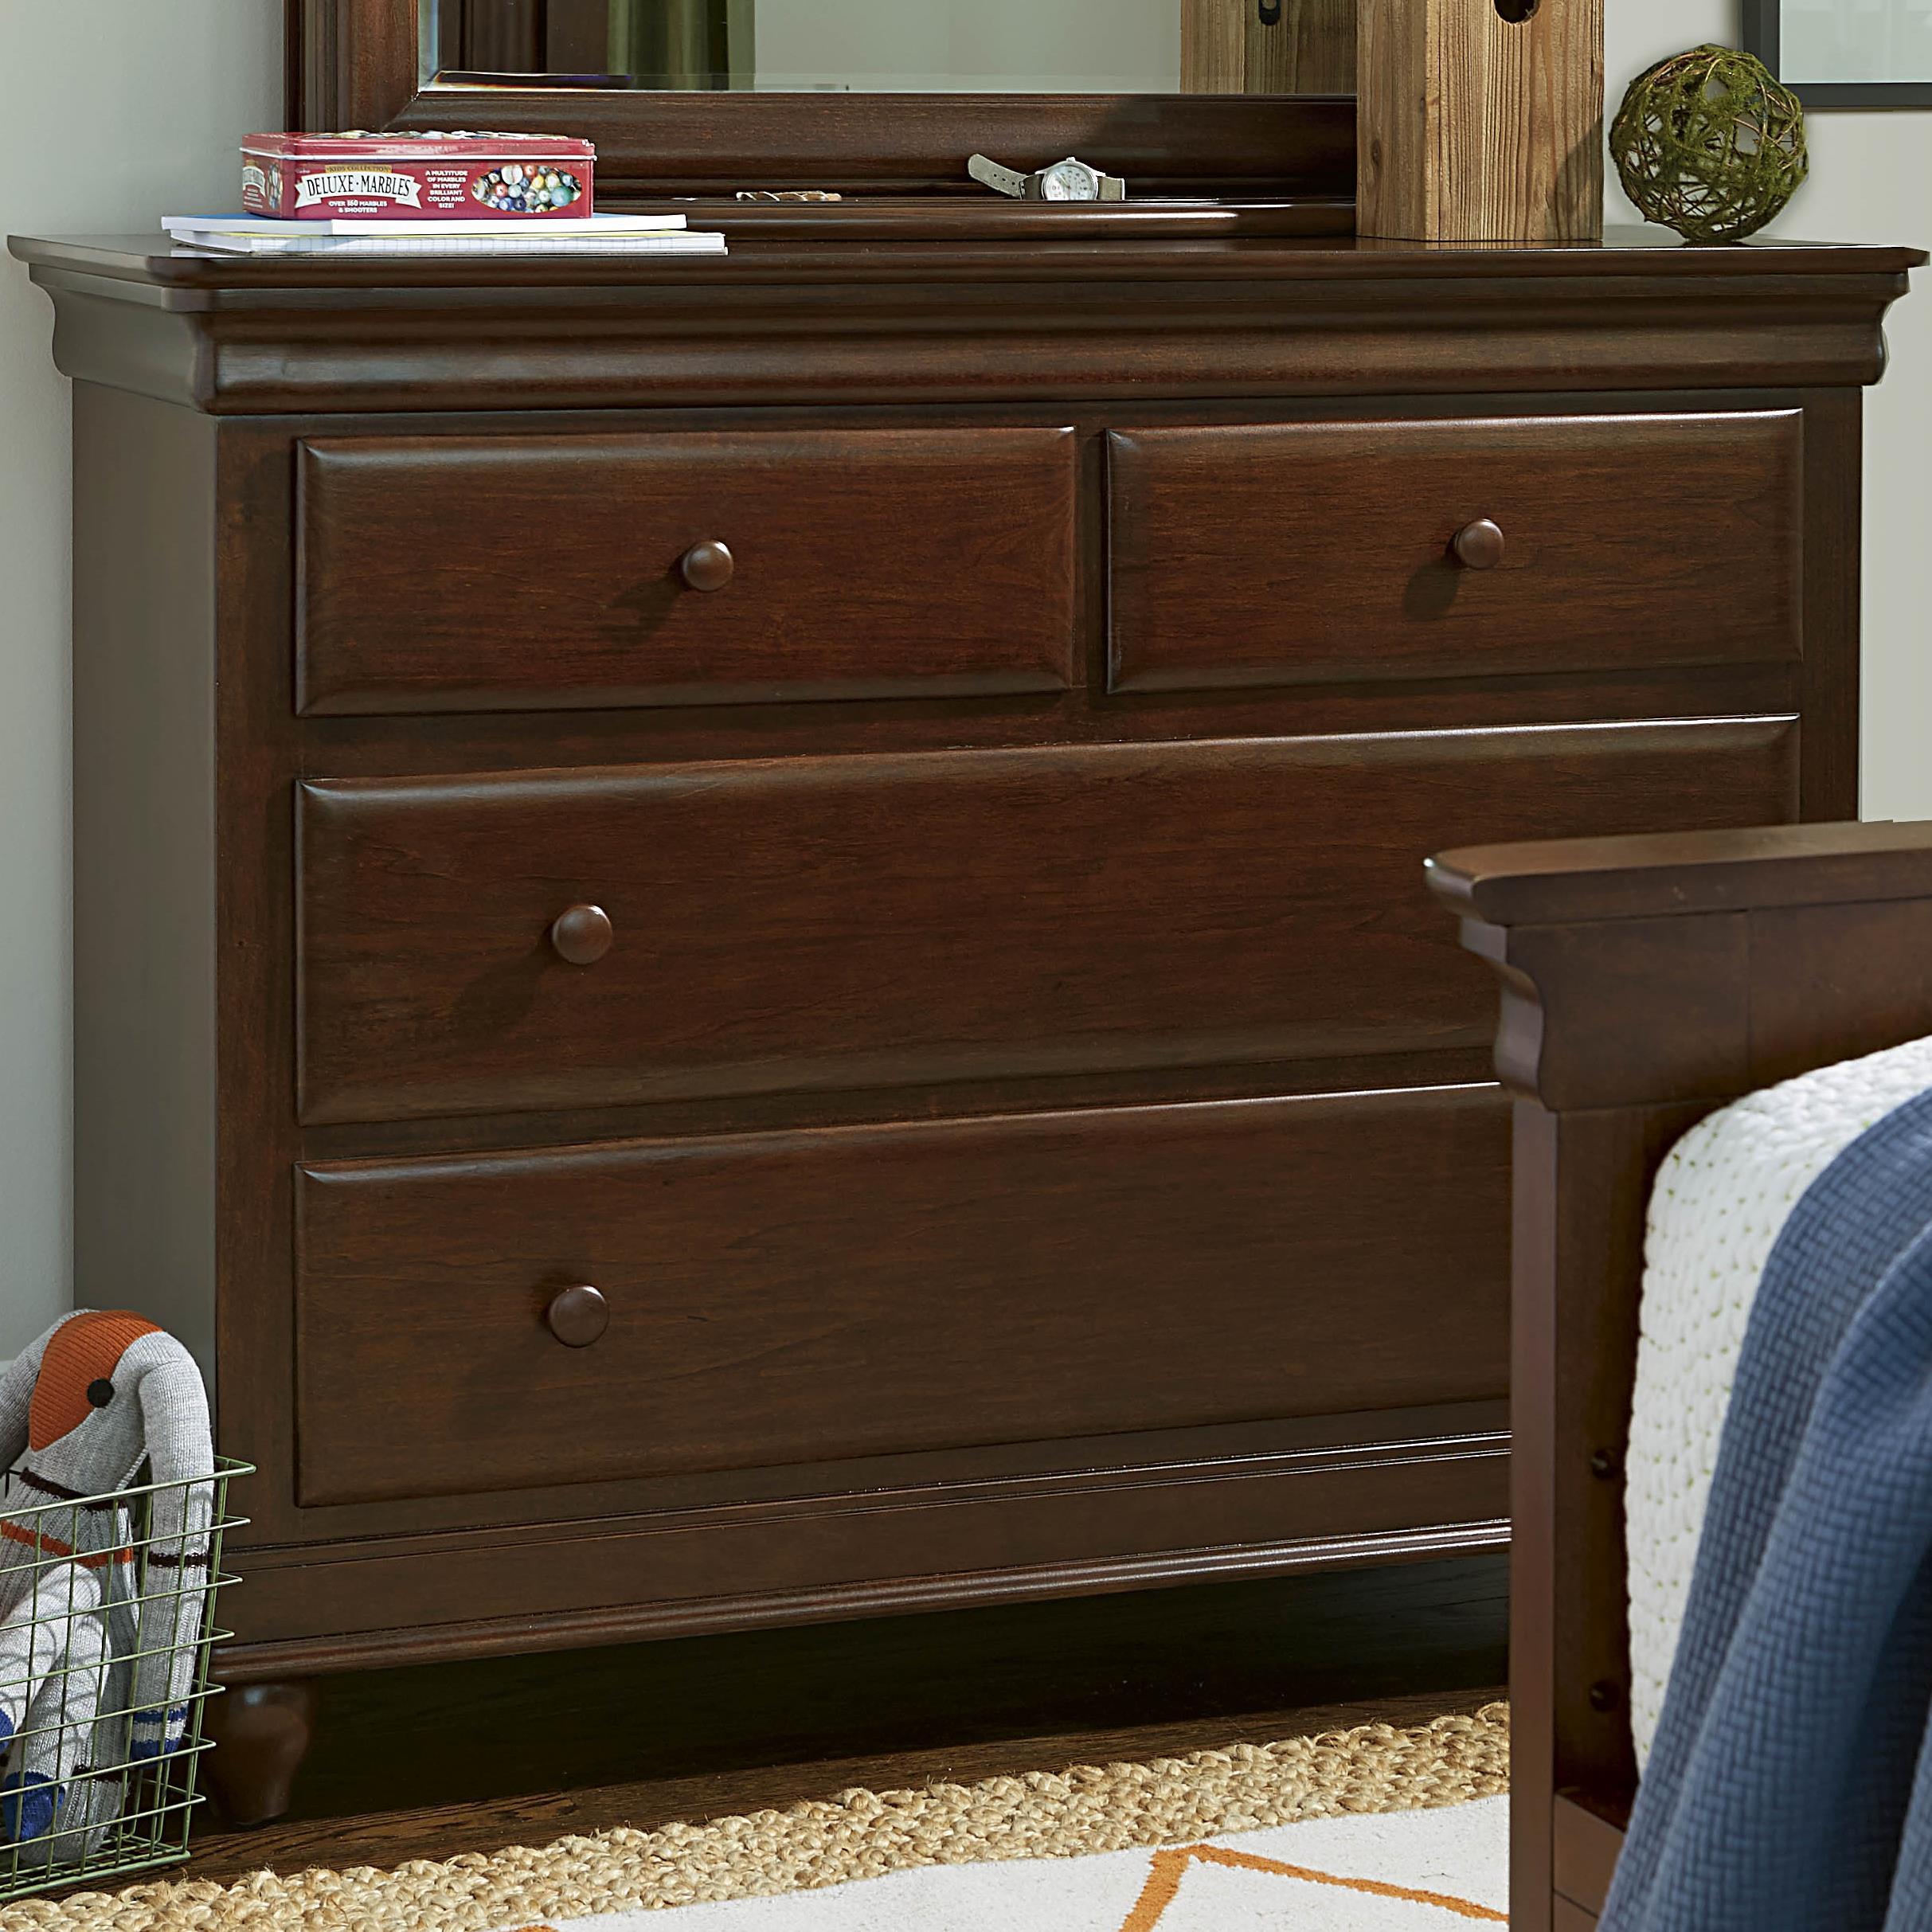 Smartstuff Classics 4.0 Single Dresser - Item Number: 1312001